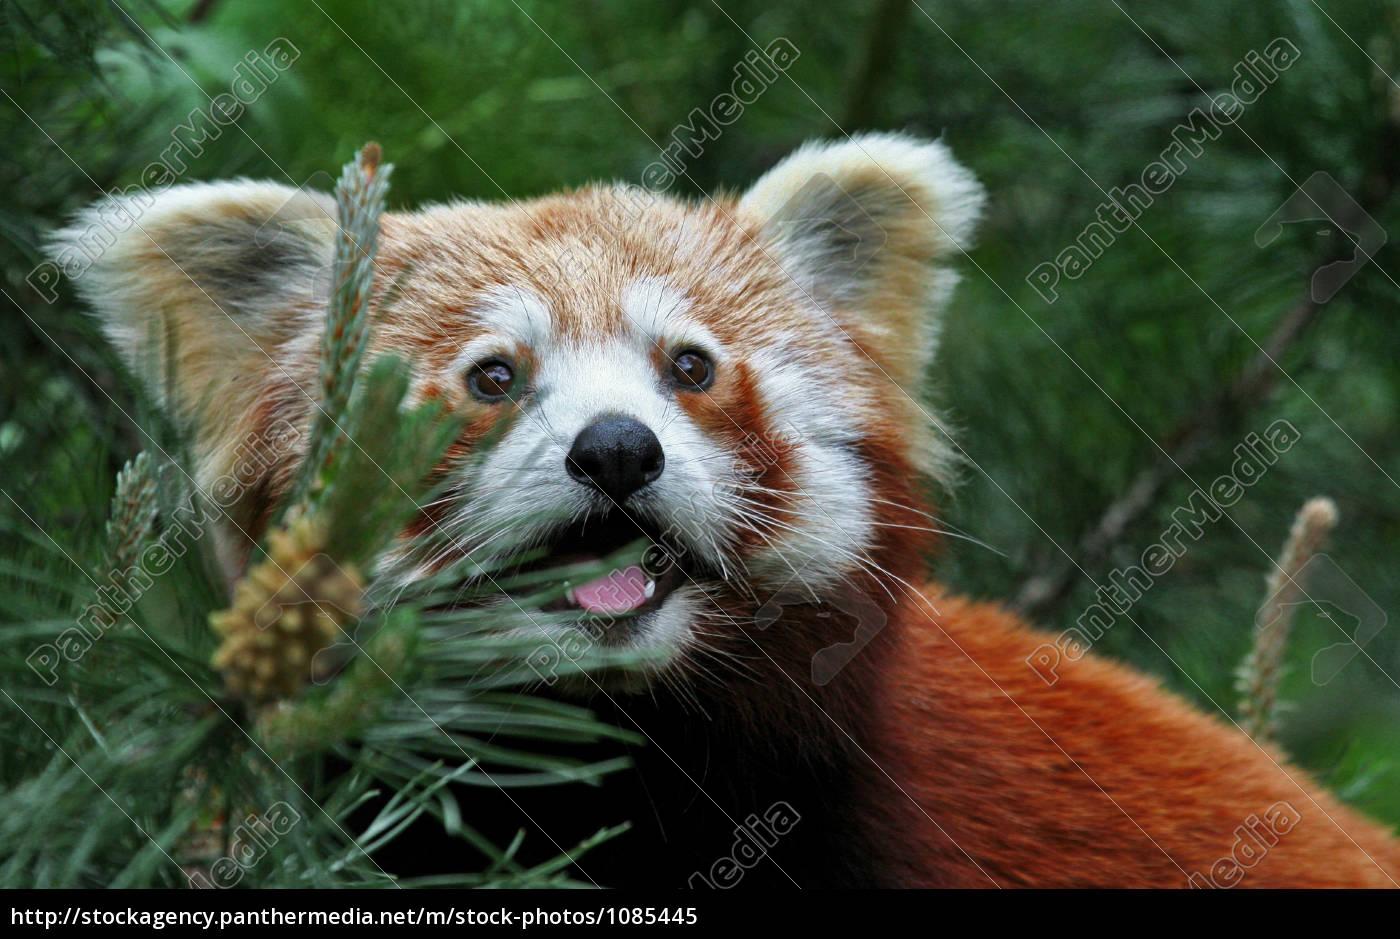 little, panda - 1085445